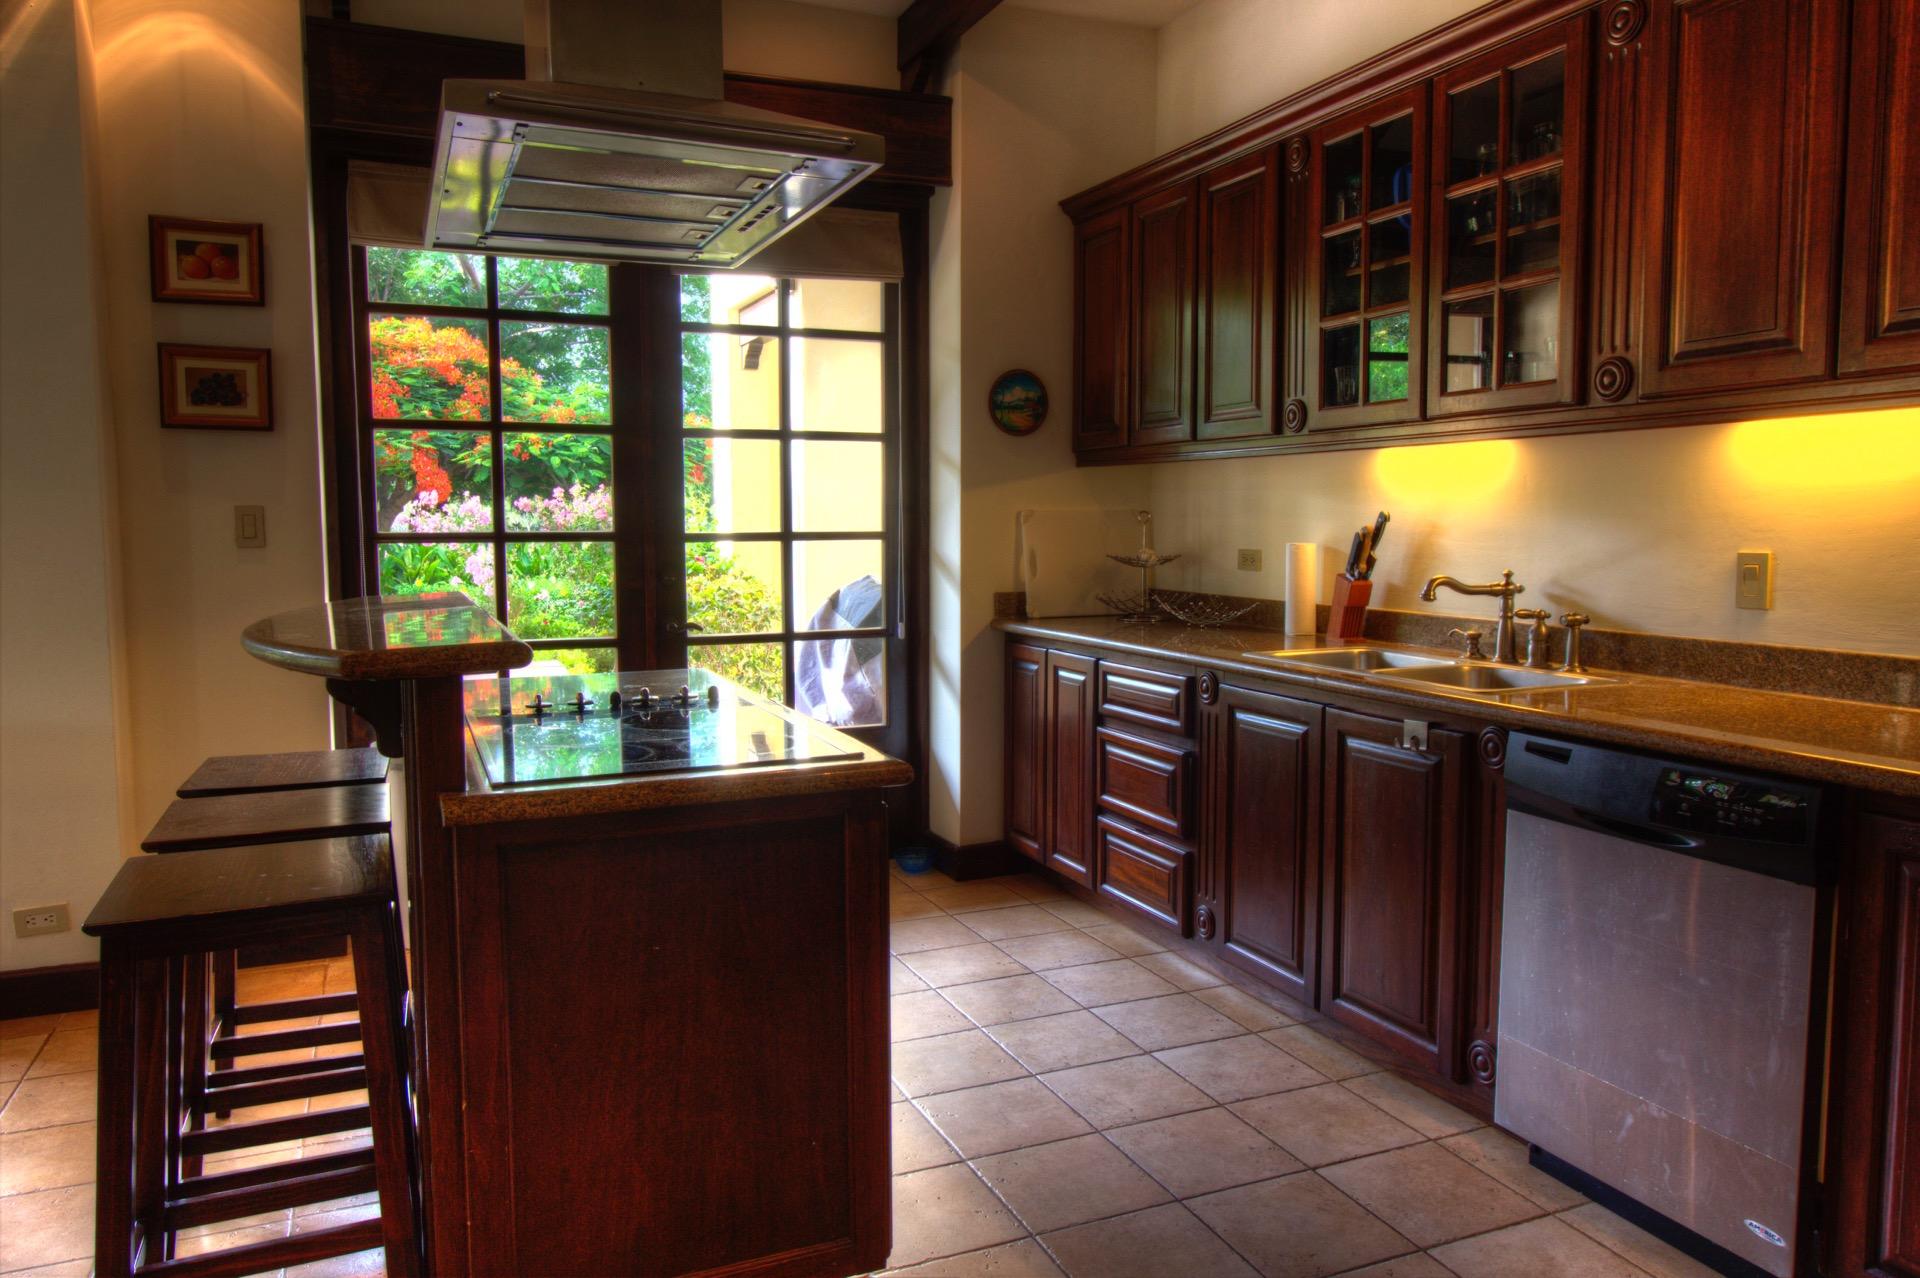 Beautiful kitchen with breakfast bar